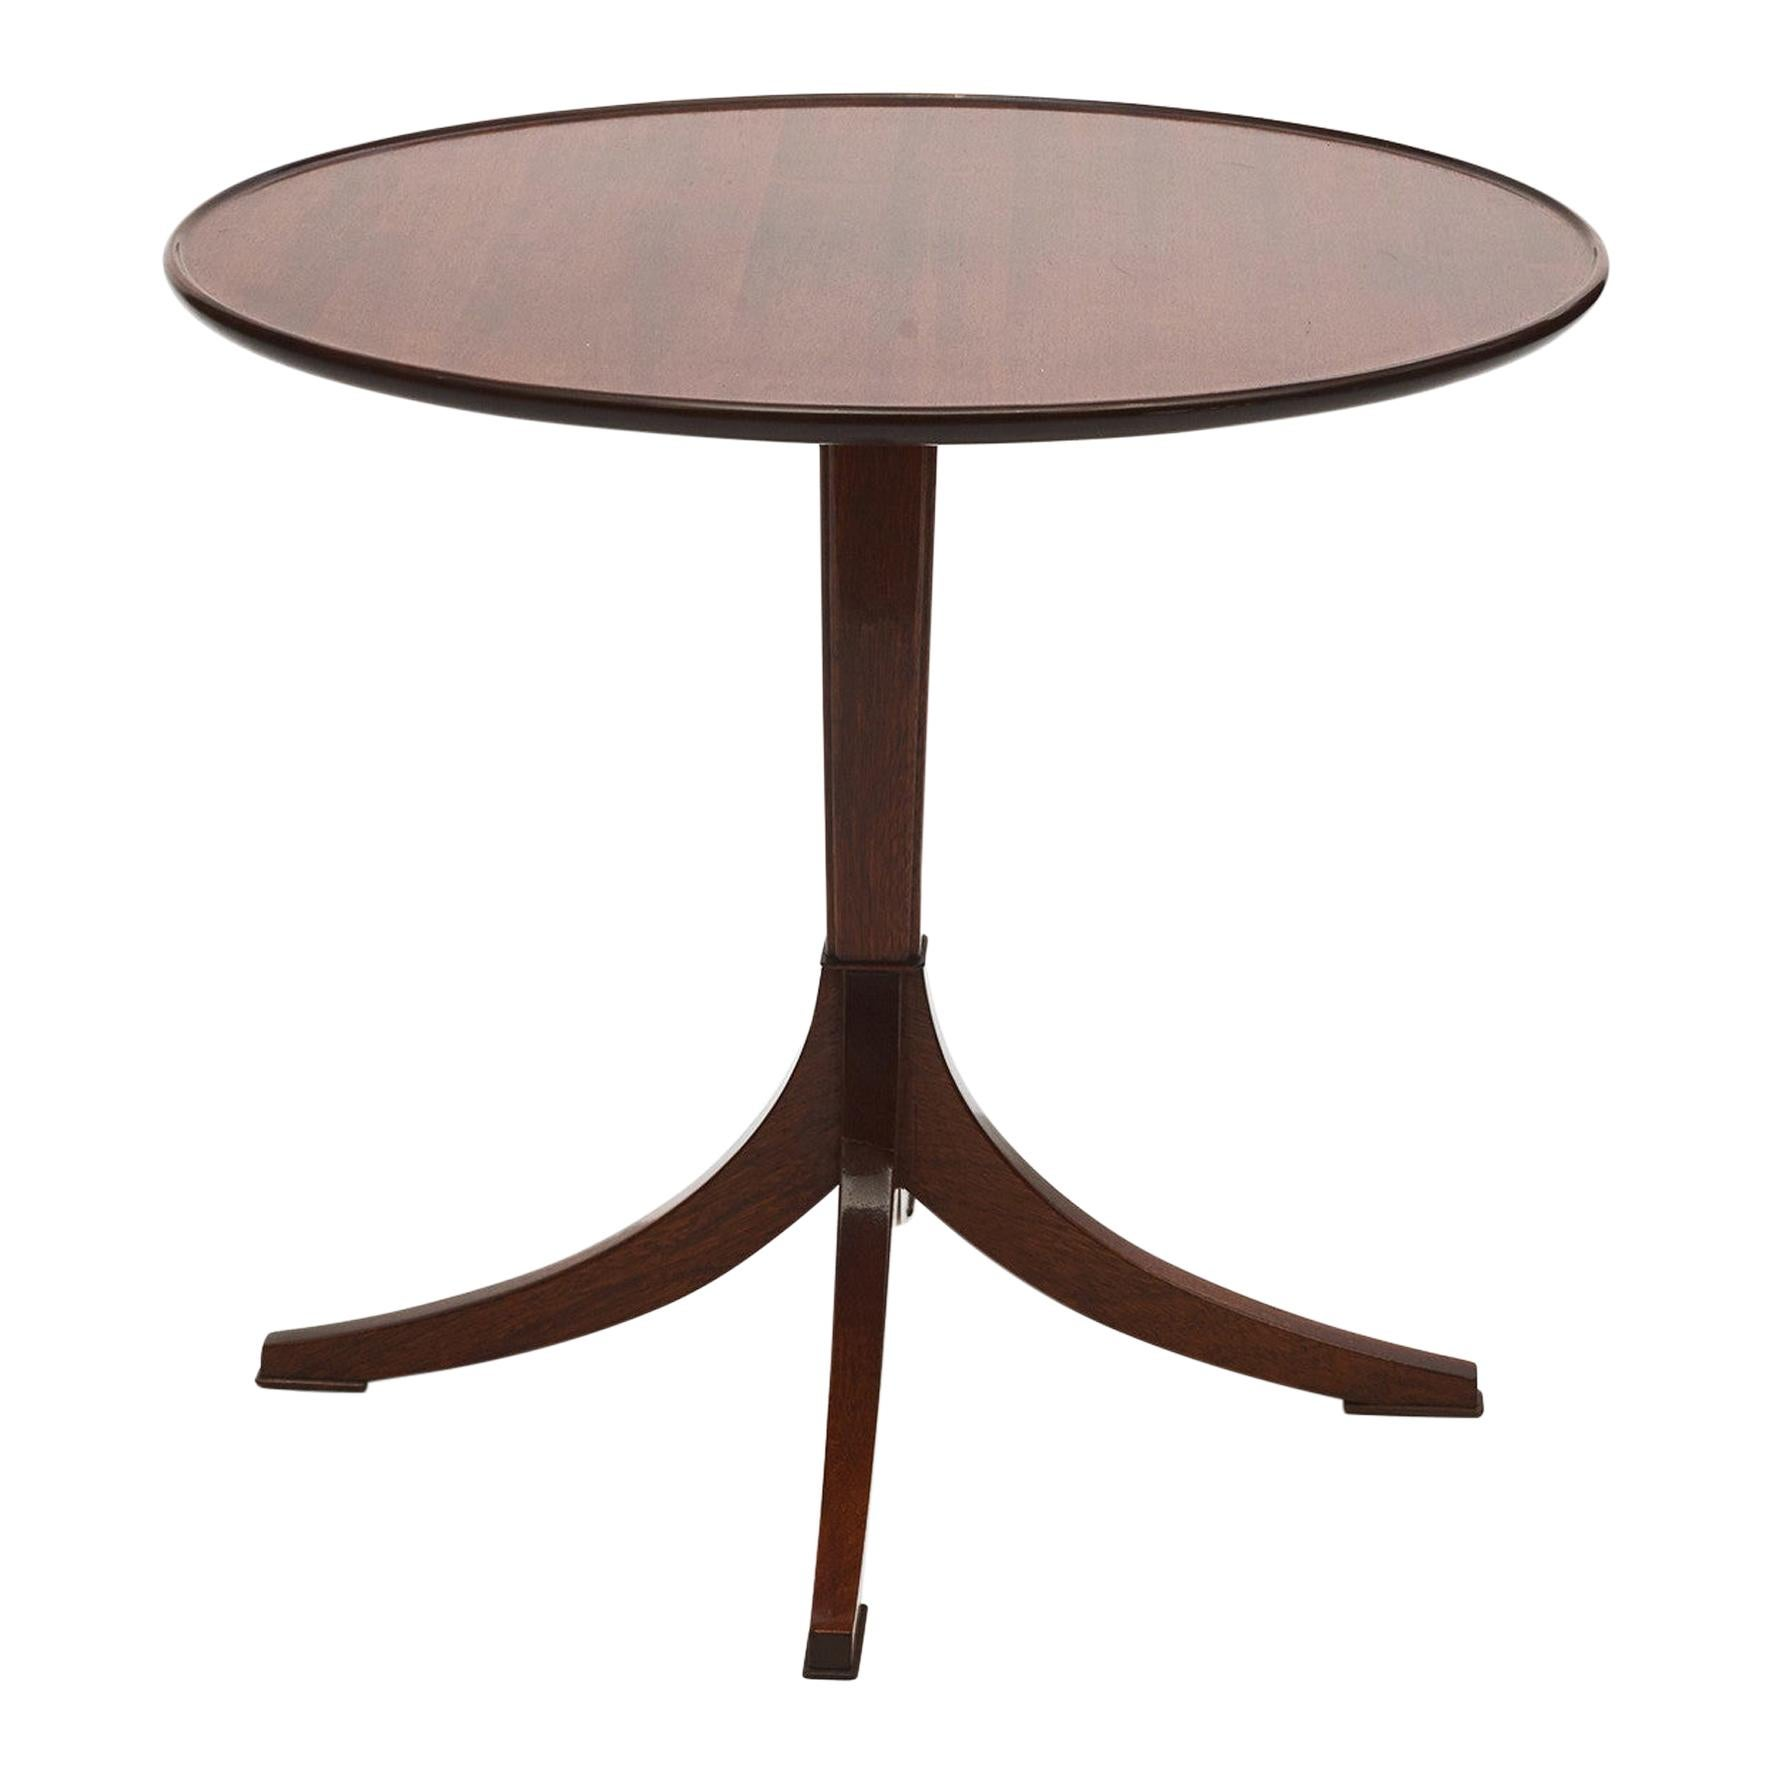 Frits Henningsen Mahogany Side Table